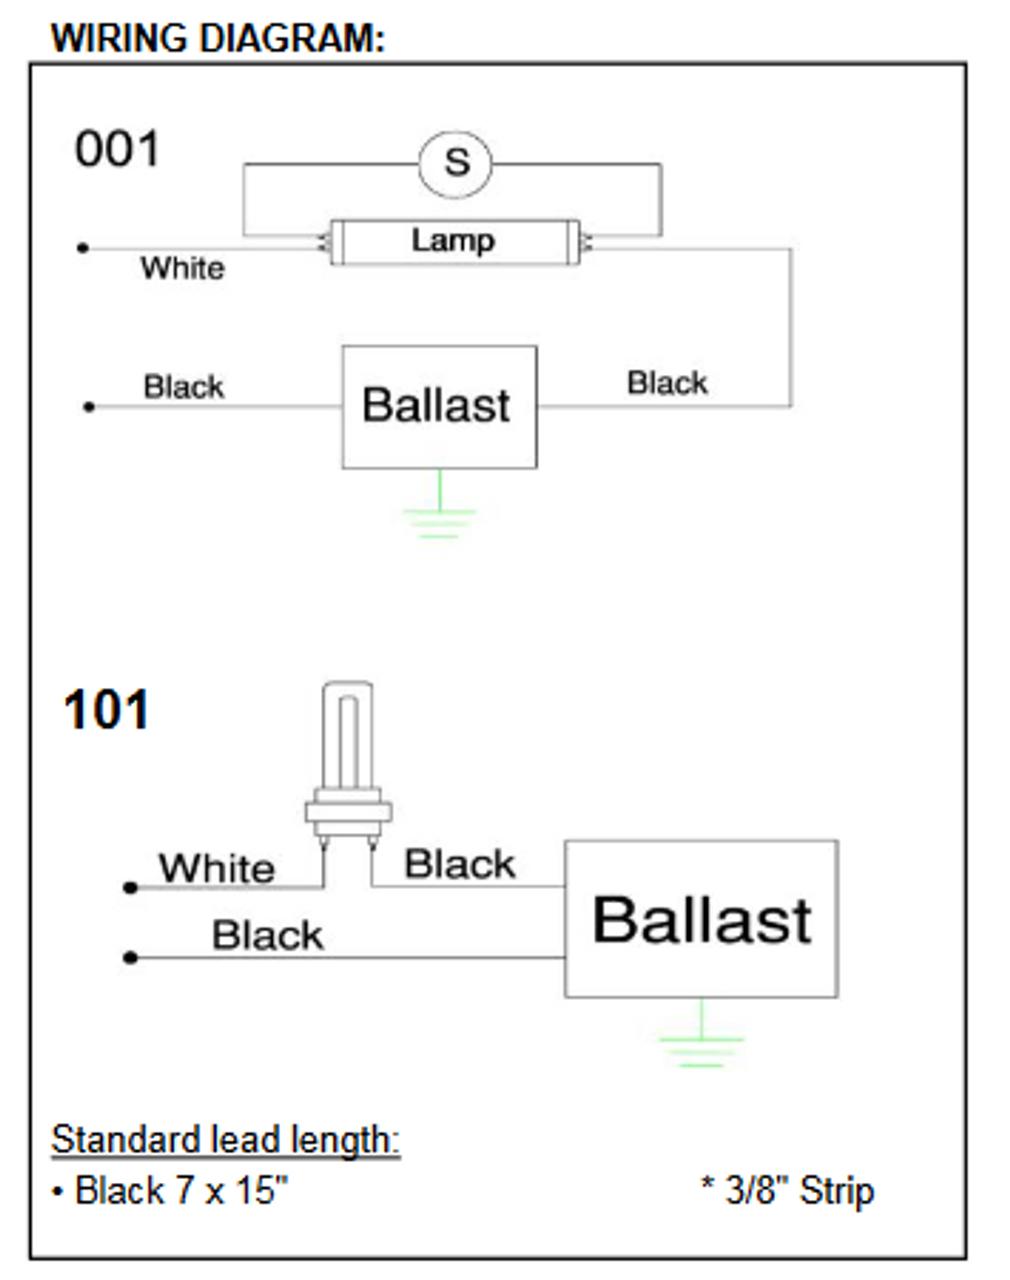 SPPW SPP Robertson Fluorescent Replacement Ballasts - Robertson ballast wiring diagram